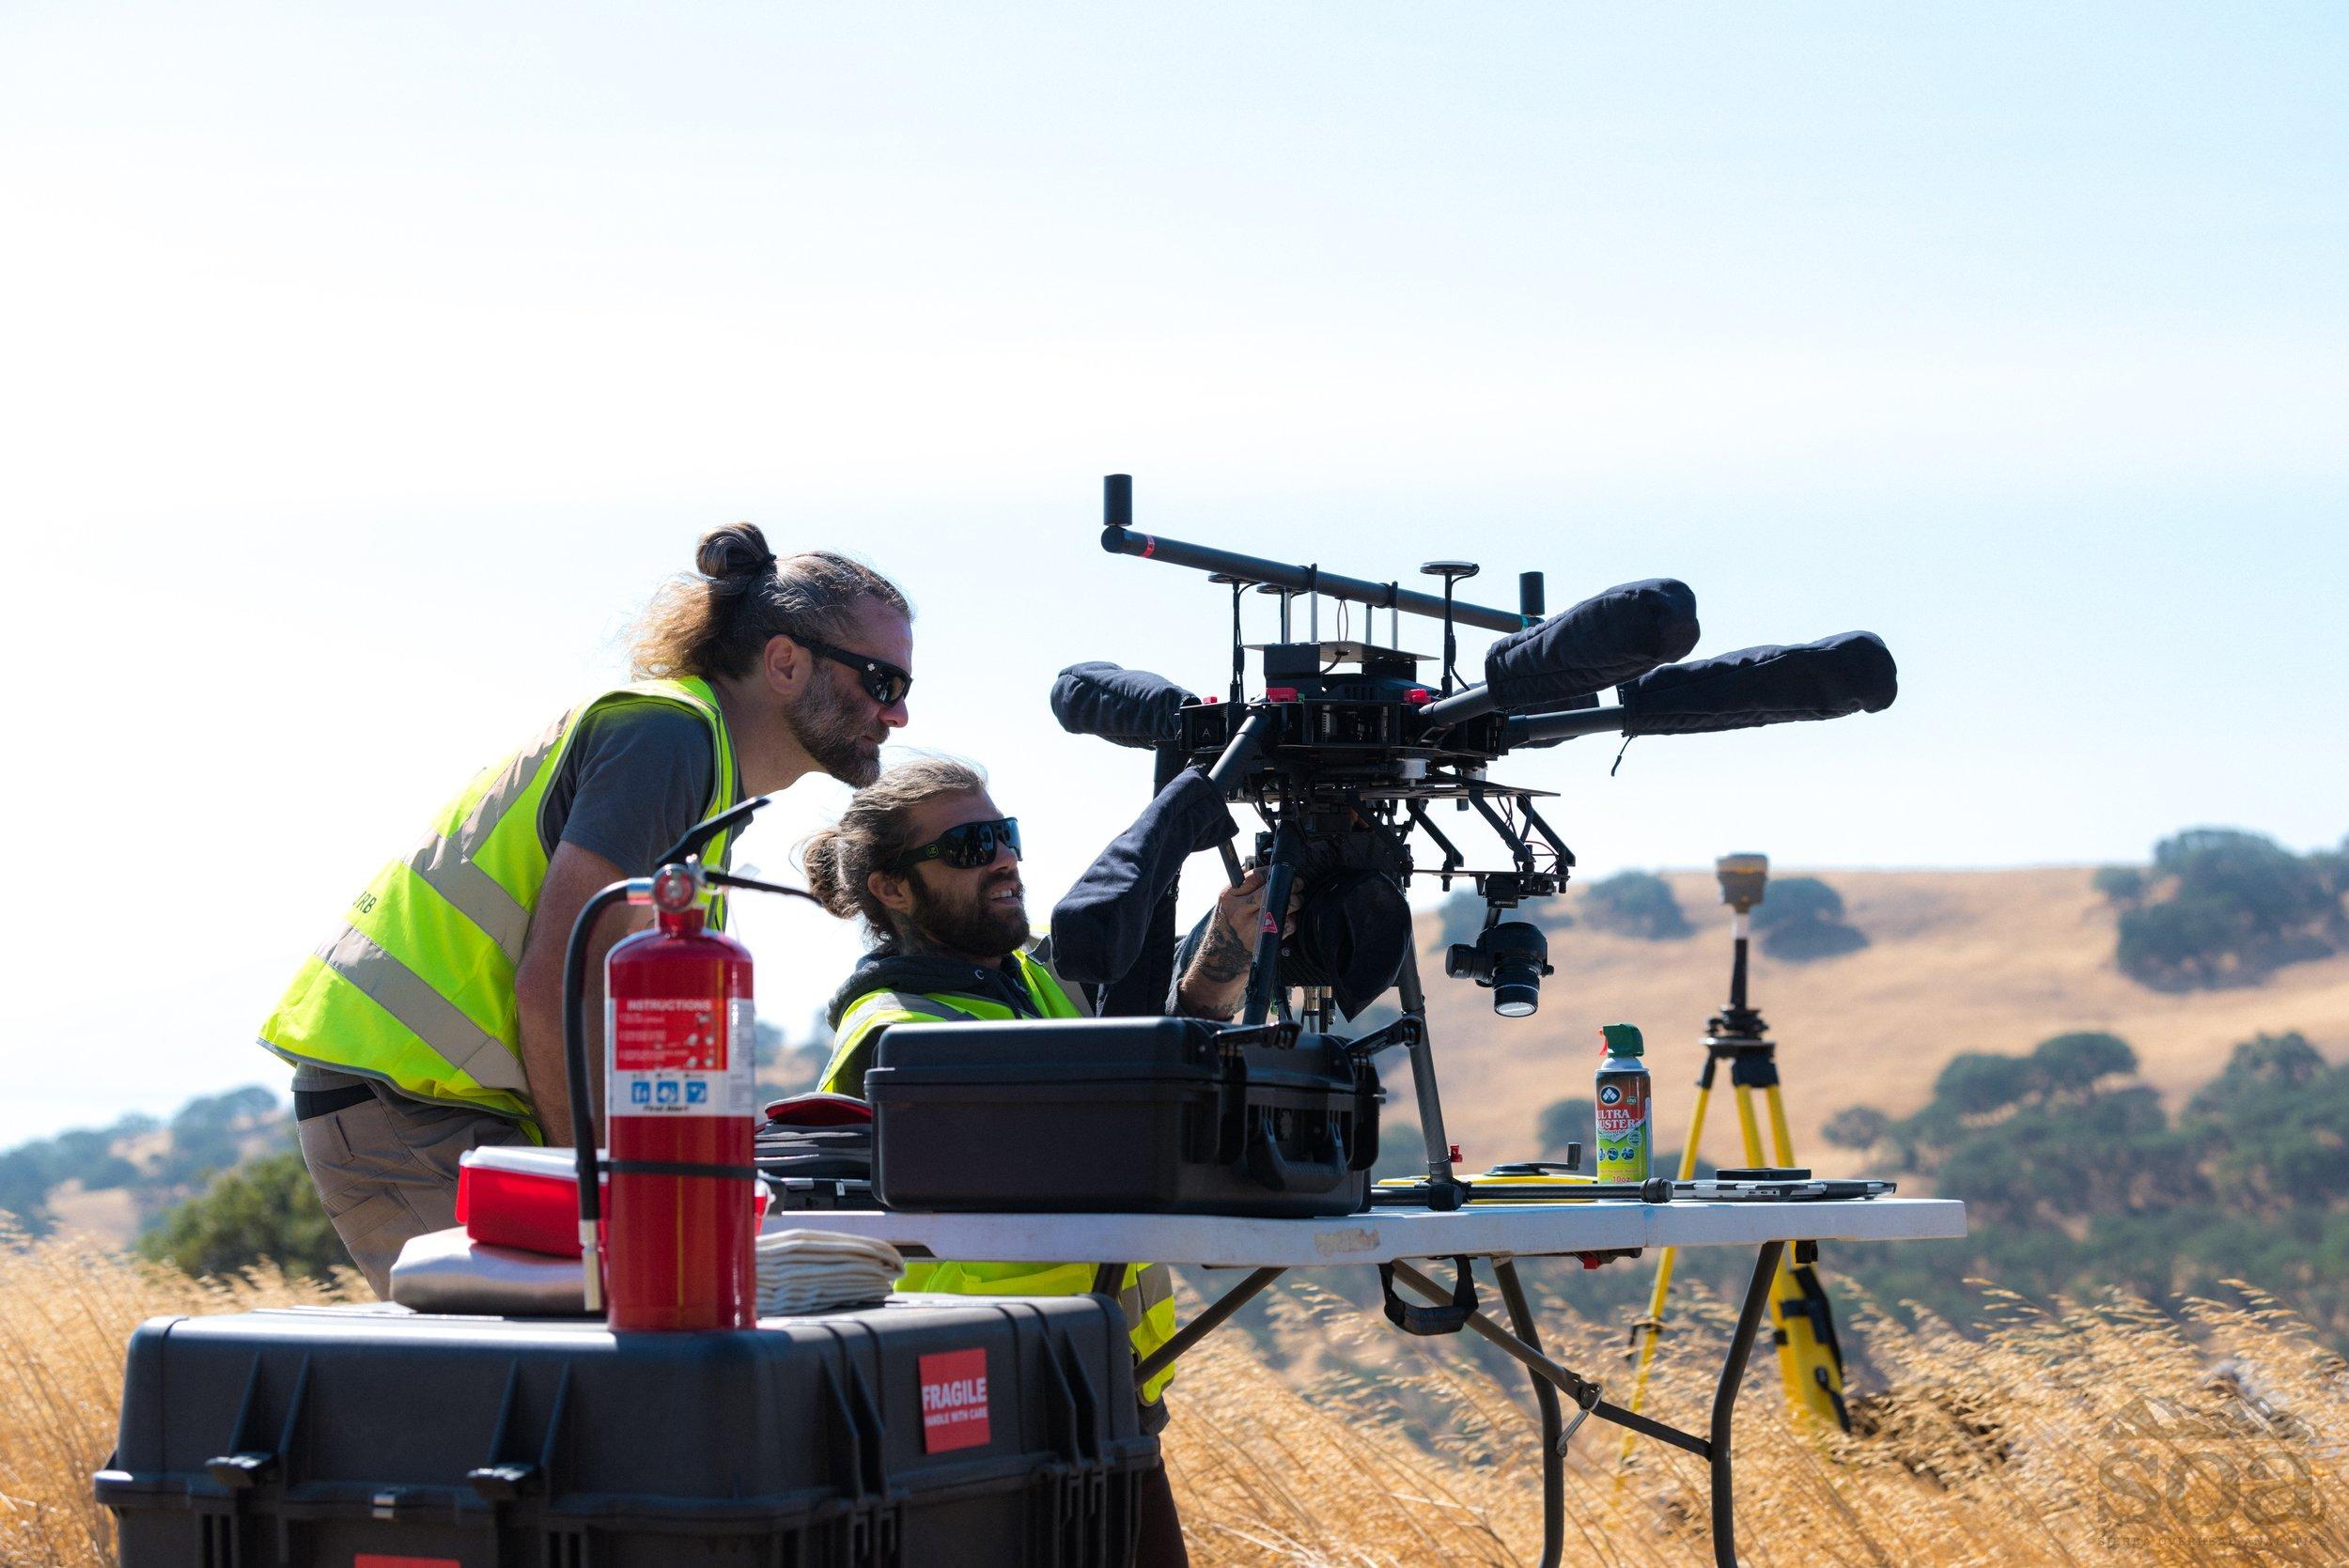 SOA field crews preparing a LiDAR-equipped sUAS for flight in Tulare, CA.